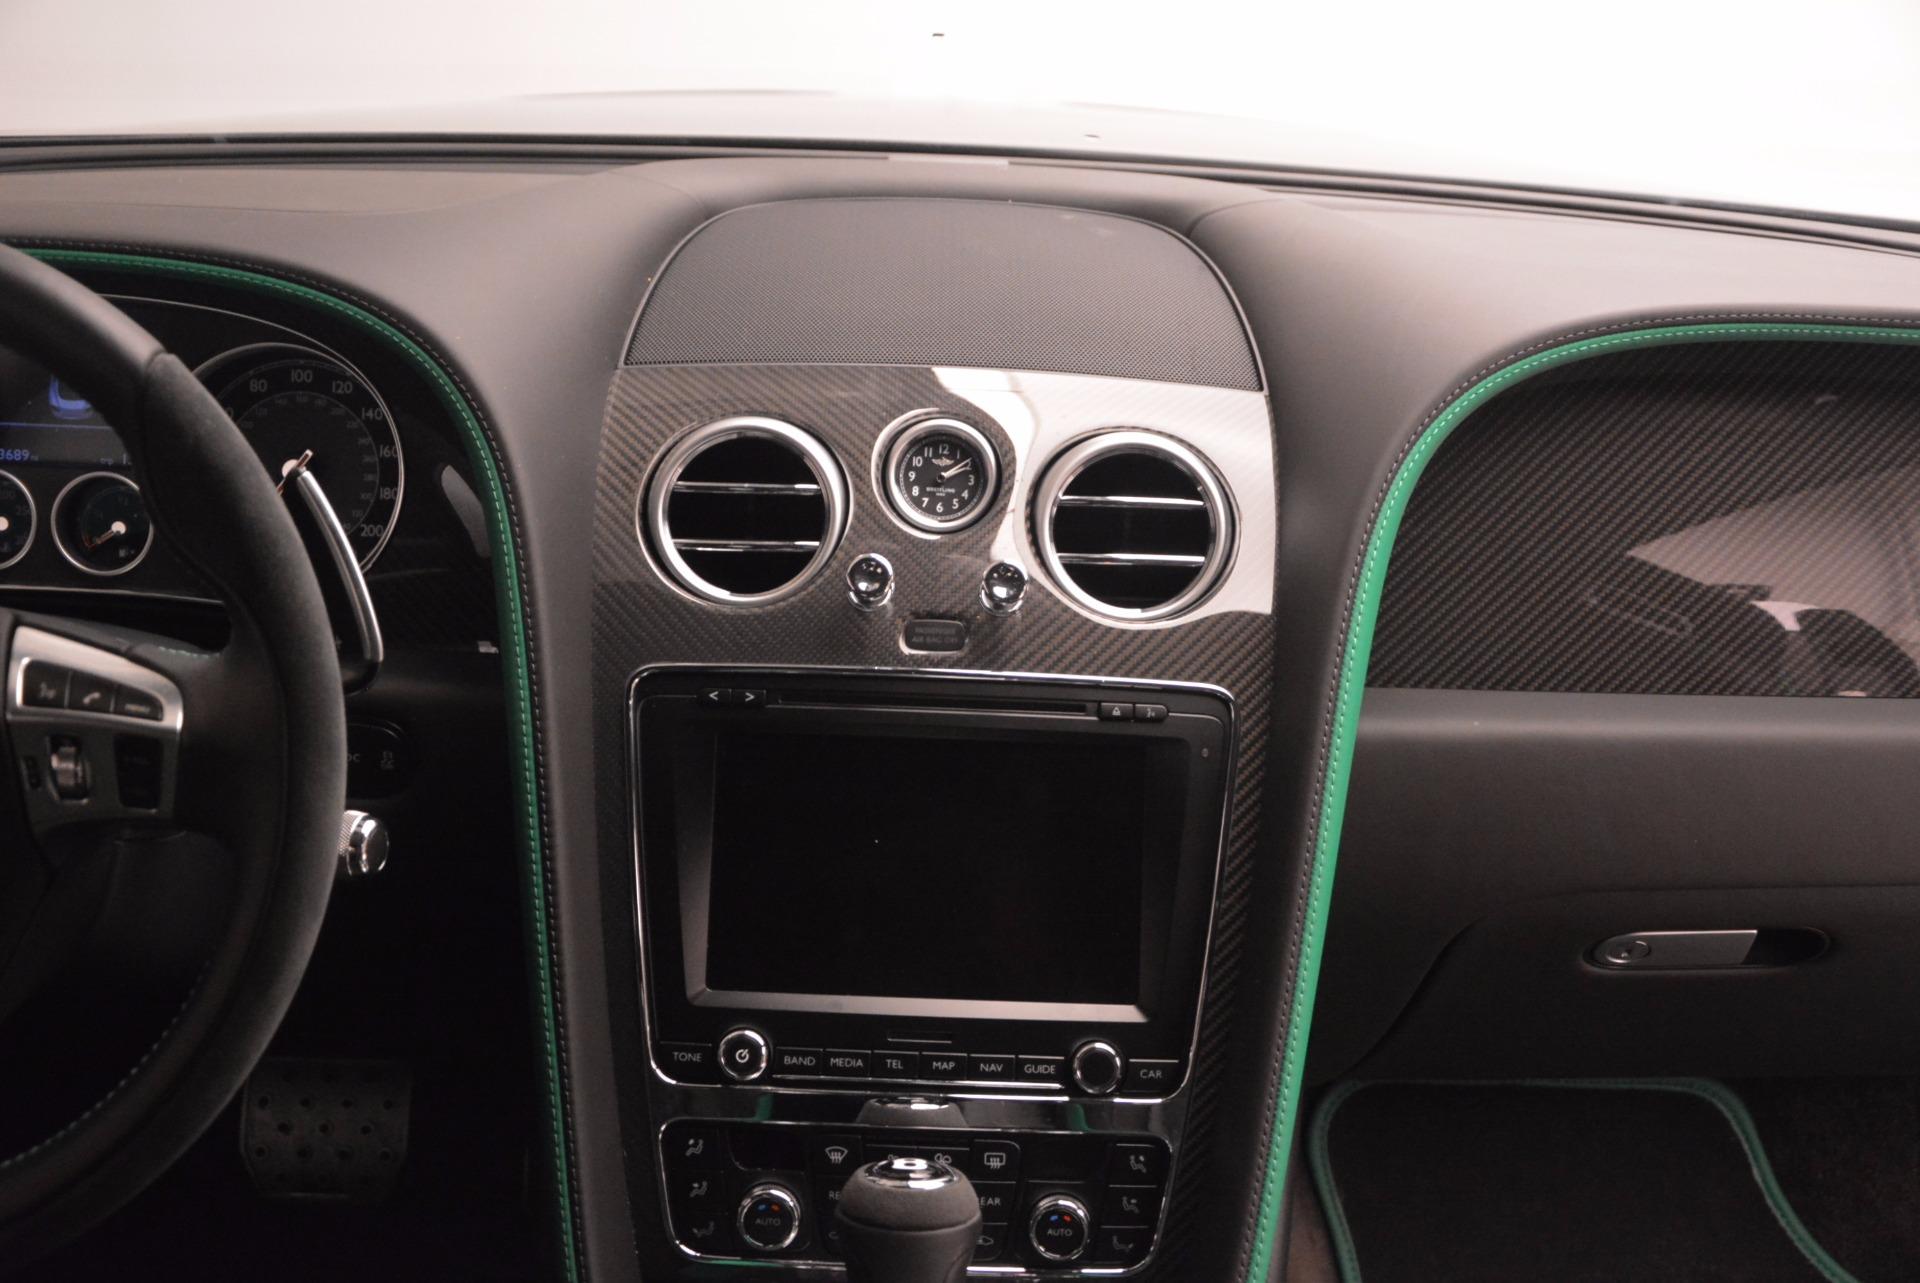 Used 2015 Bentley Continental GT GT3-R For Sale In Westport, CT 1002_p48